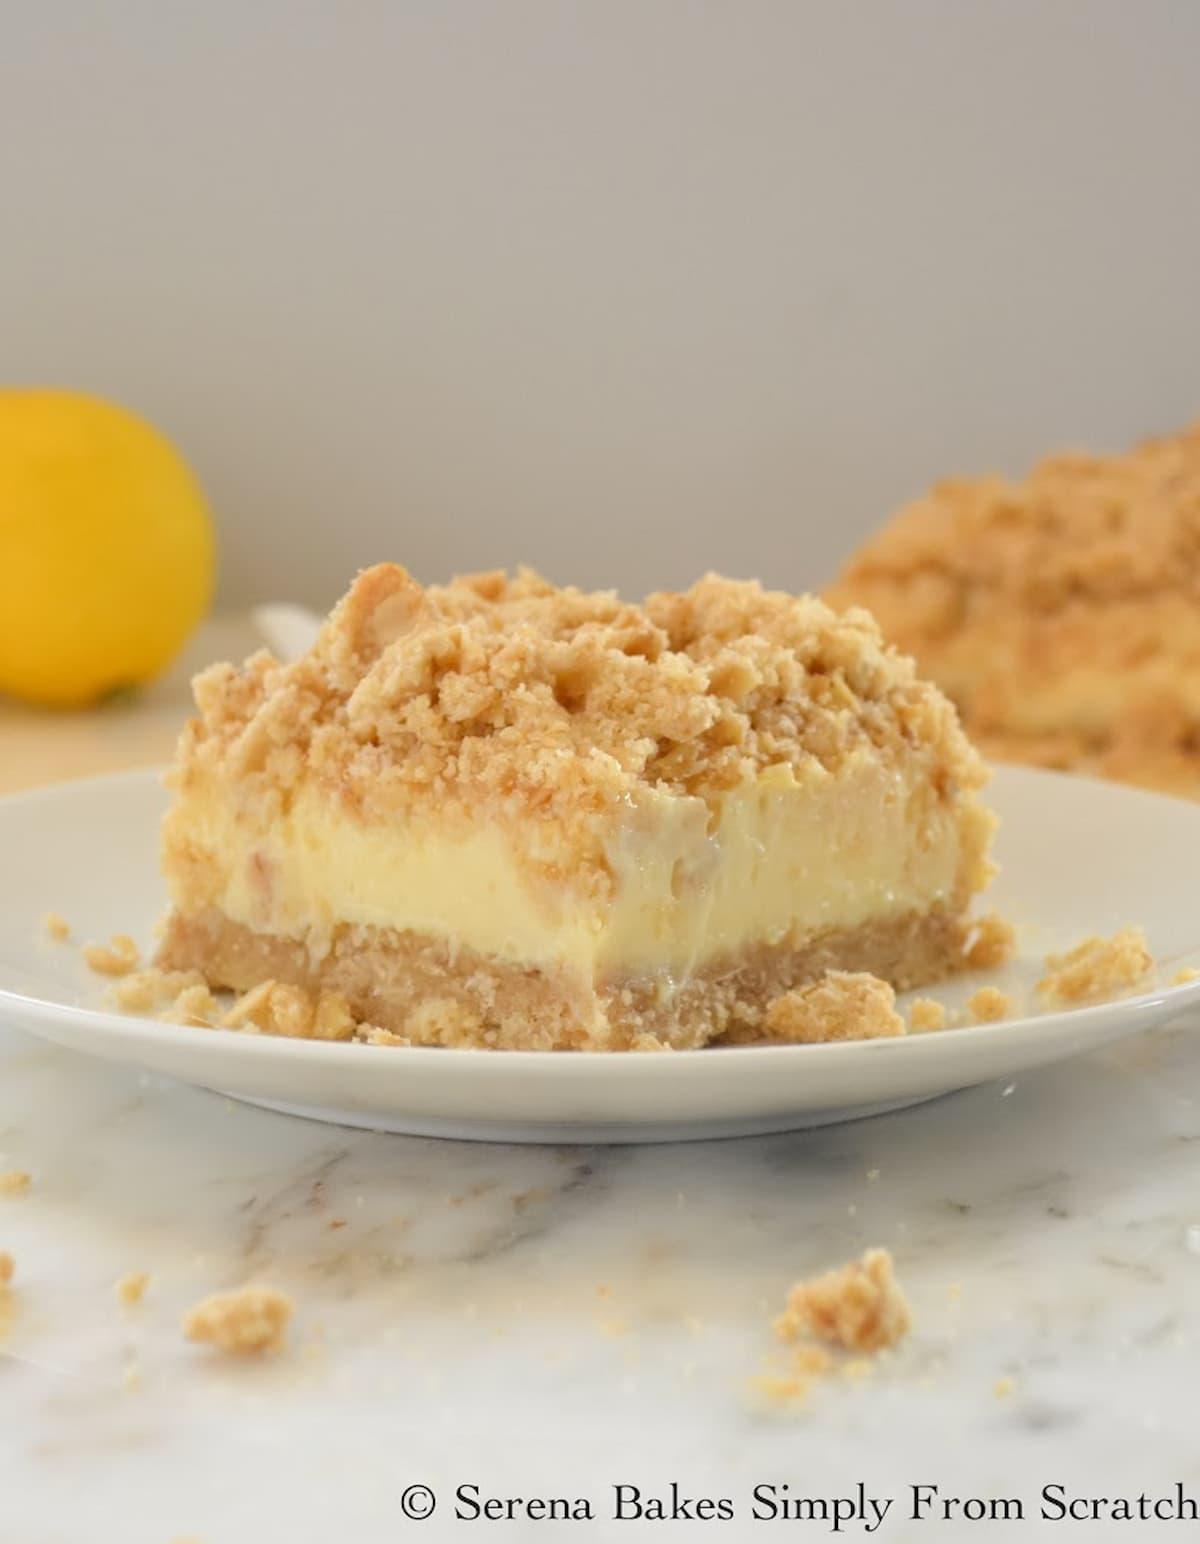 Sliced Lemon Cheesecake Crumb Bars on a white plate with a pan of Lemon Cheesecake Crumb Bars in the background.